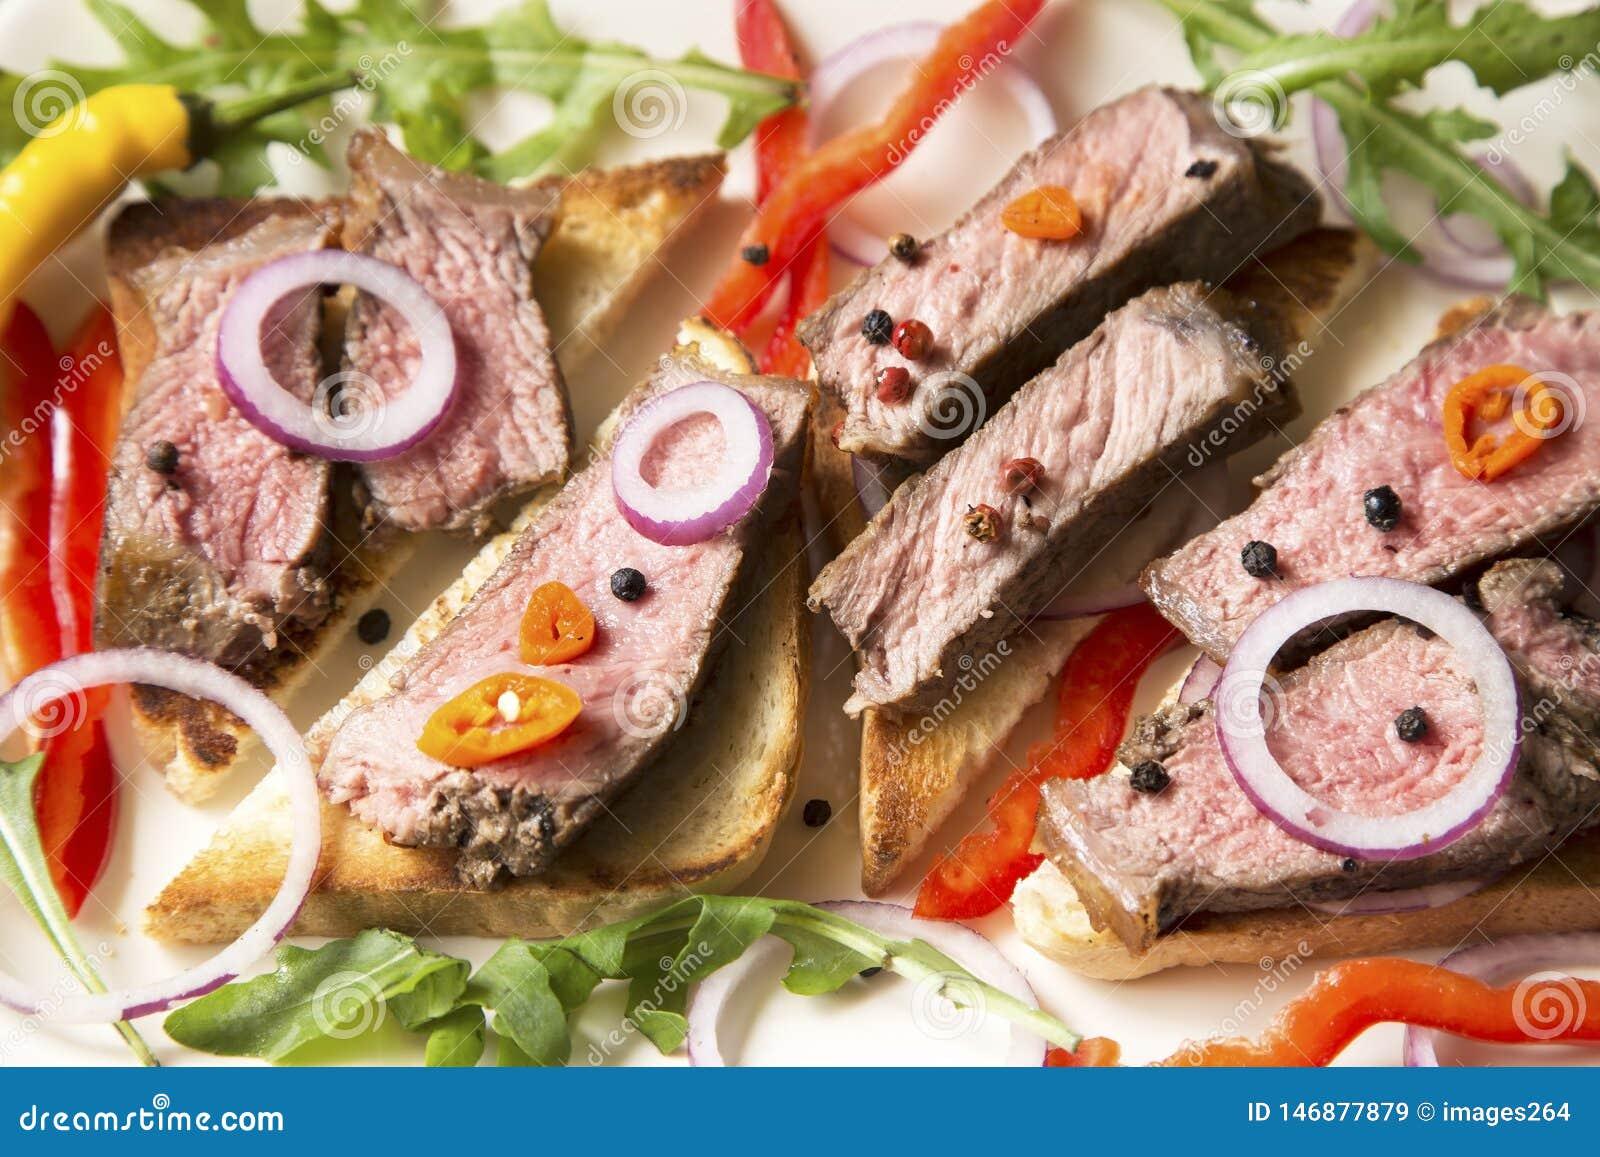 Sliced roast beef with vegetables